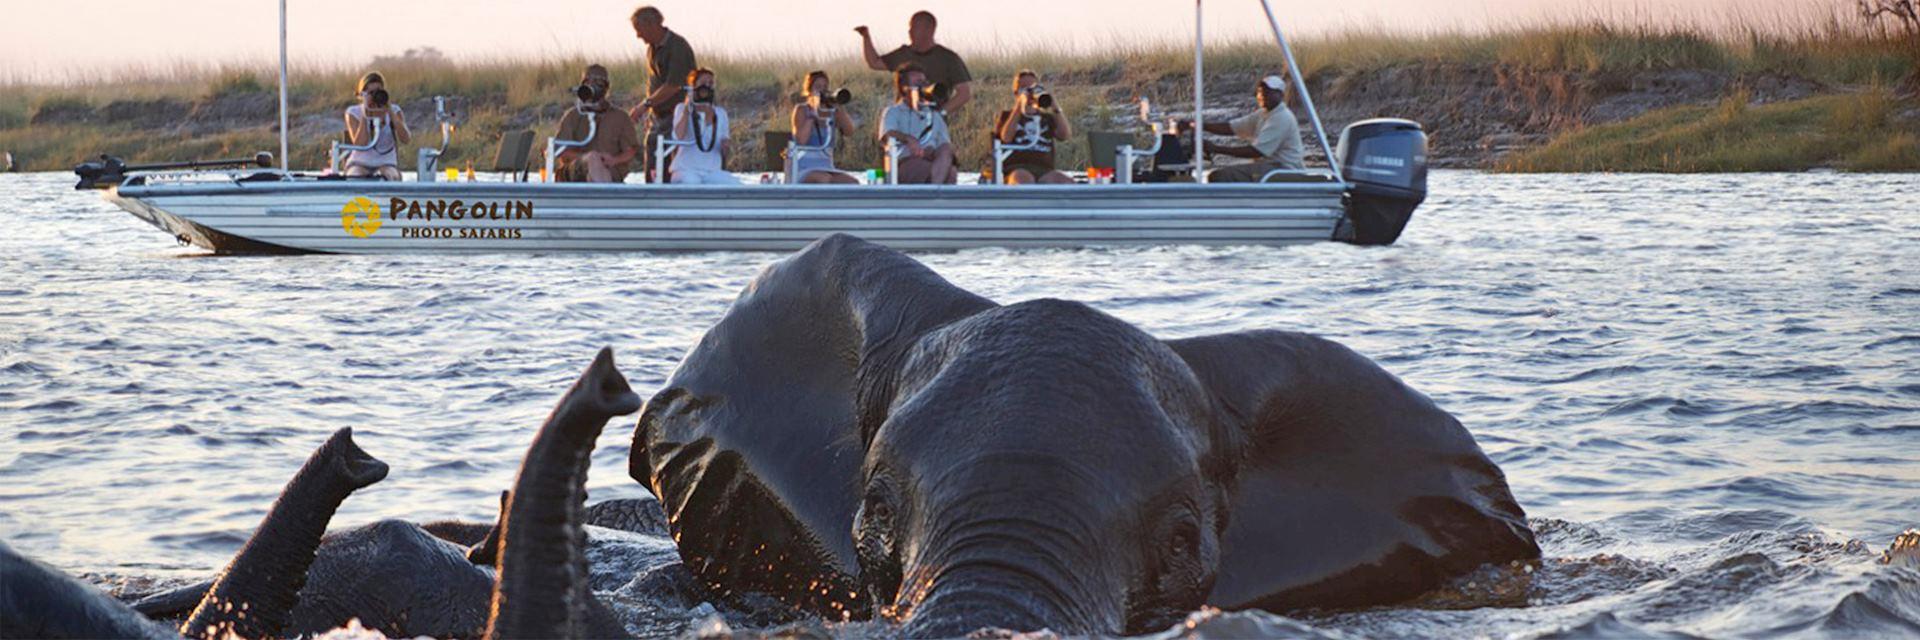 Photographic Safari, Pangolin Safaris, Chobe National Park, Botswana